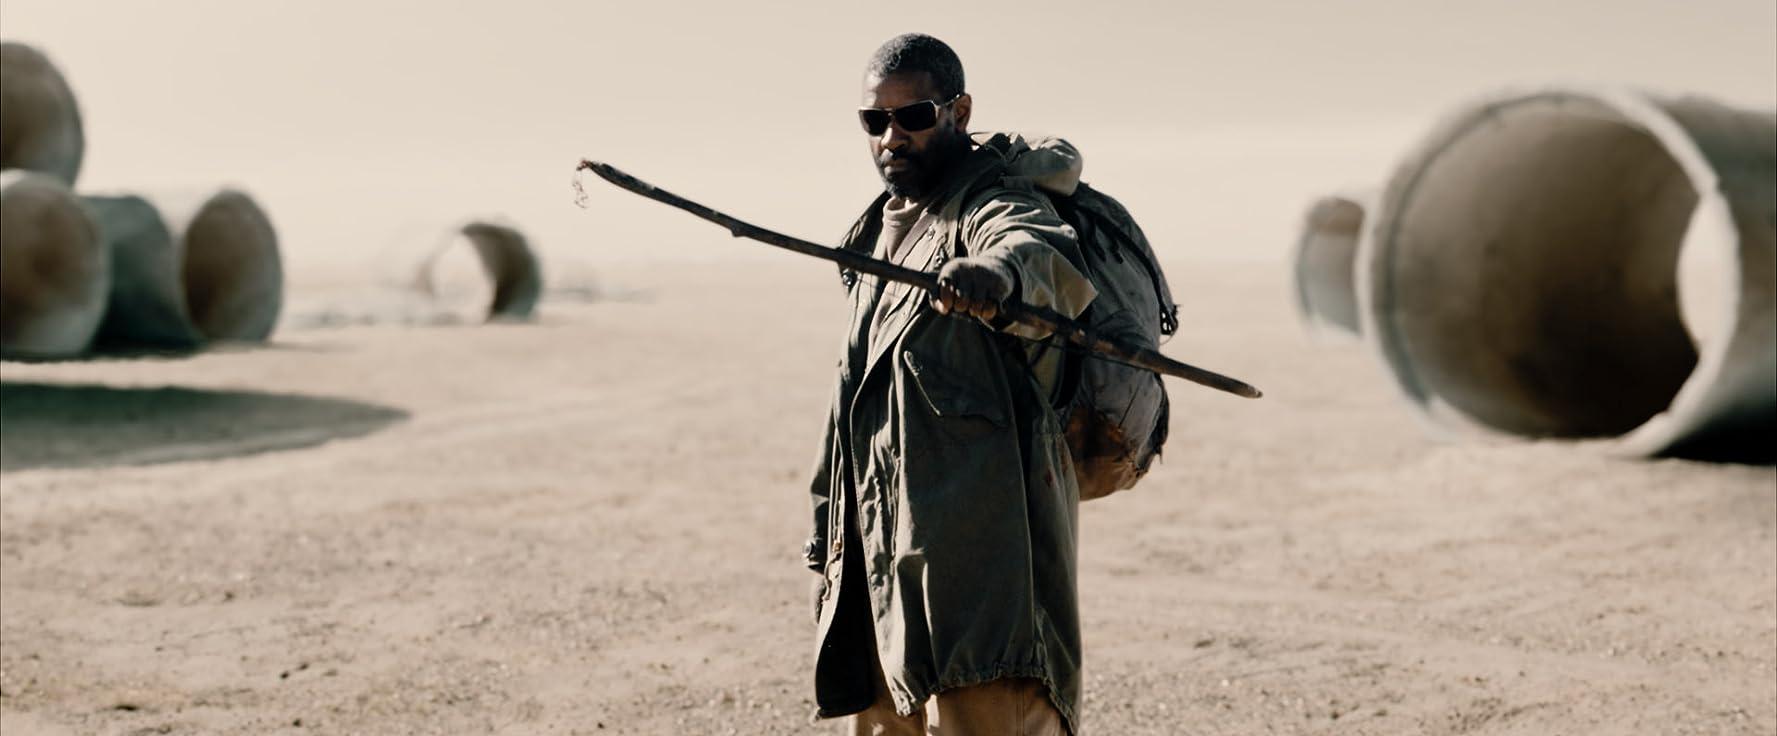 Denzel Washington in The Book of Eli (2010)